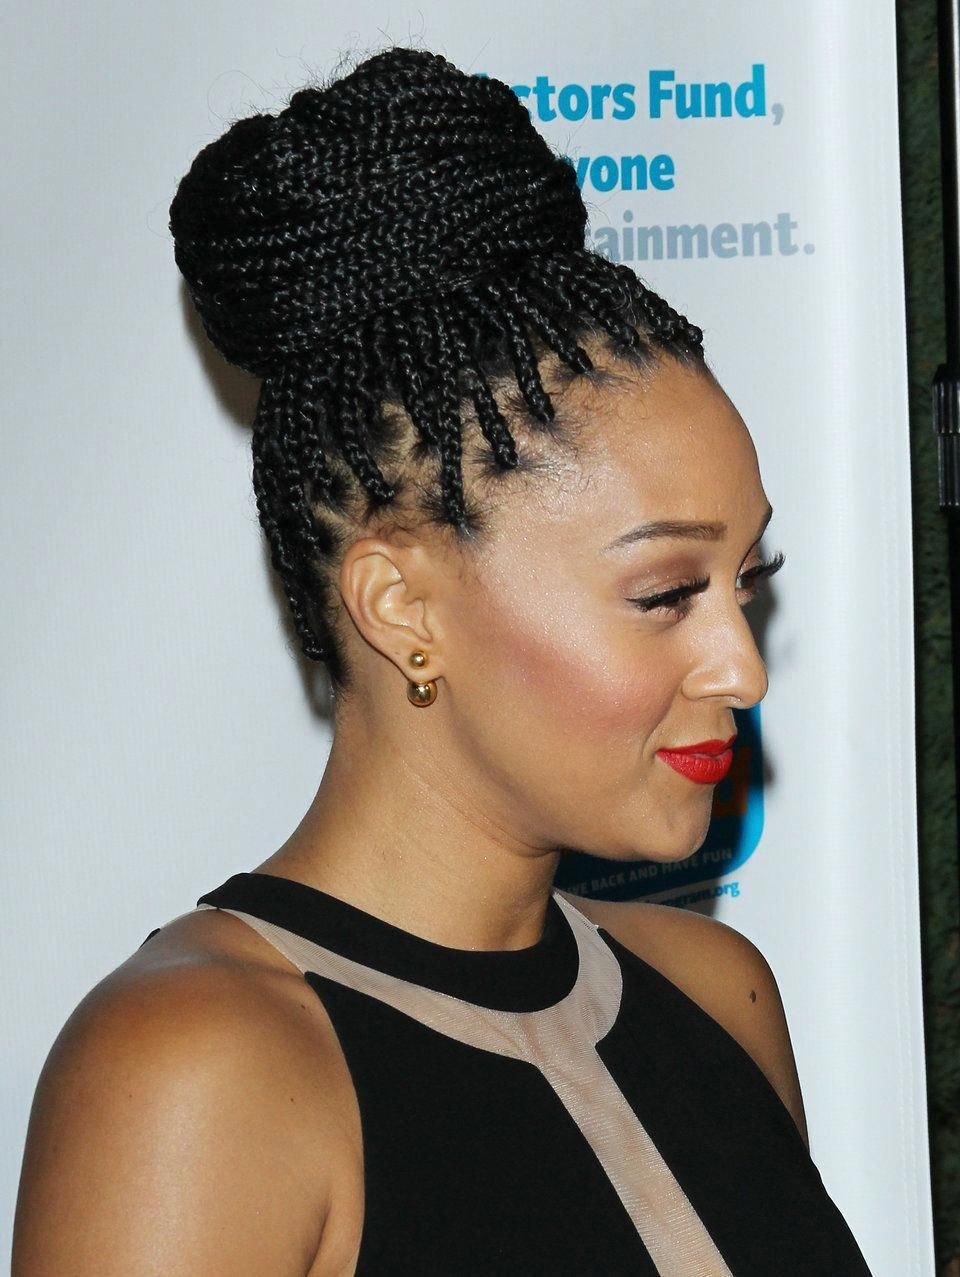 Elegant Braided Hairstyles Bridesmaids Braidedhairstyles Box Braids Hairstyles Box Braids Styling Box Braids Hairstyles For Black Women